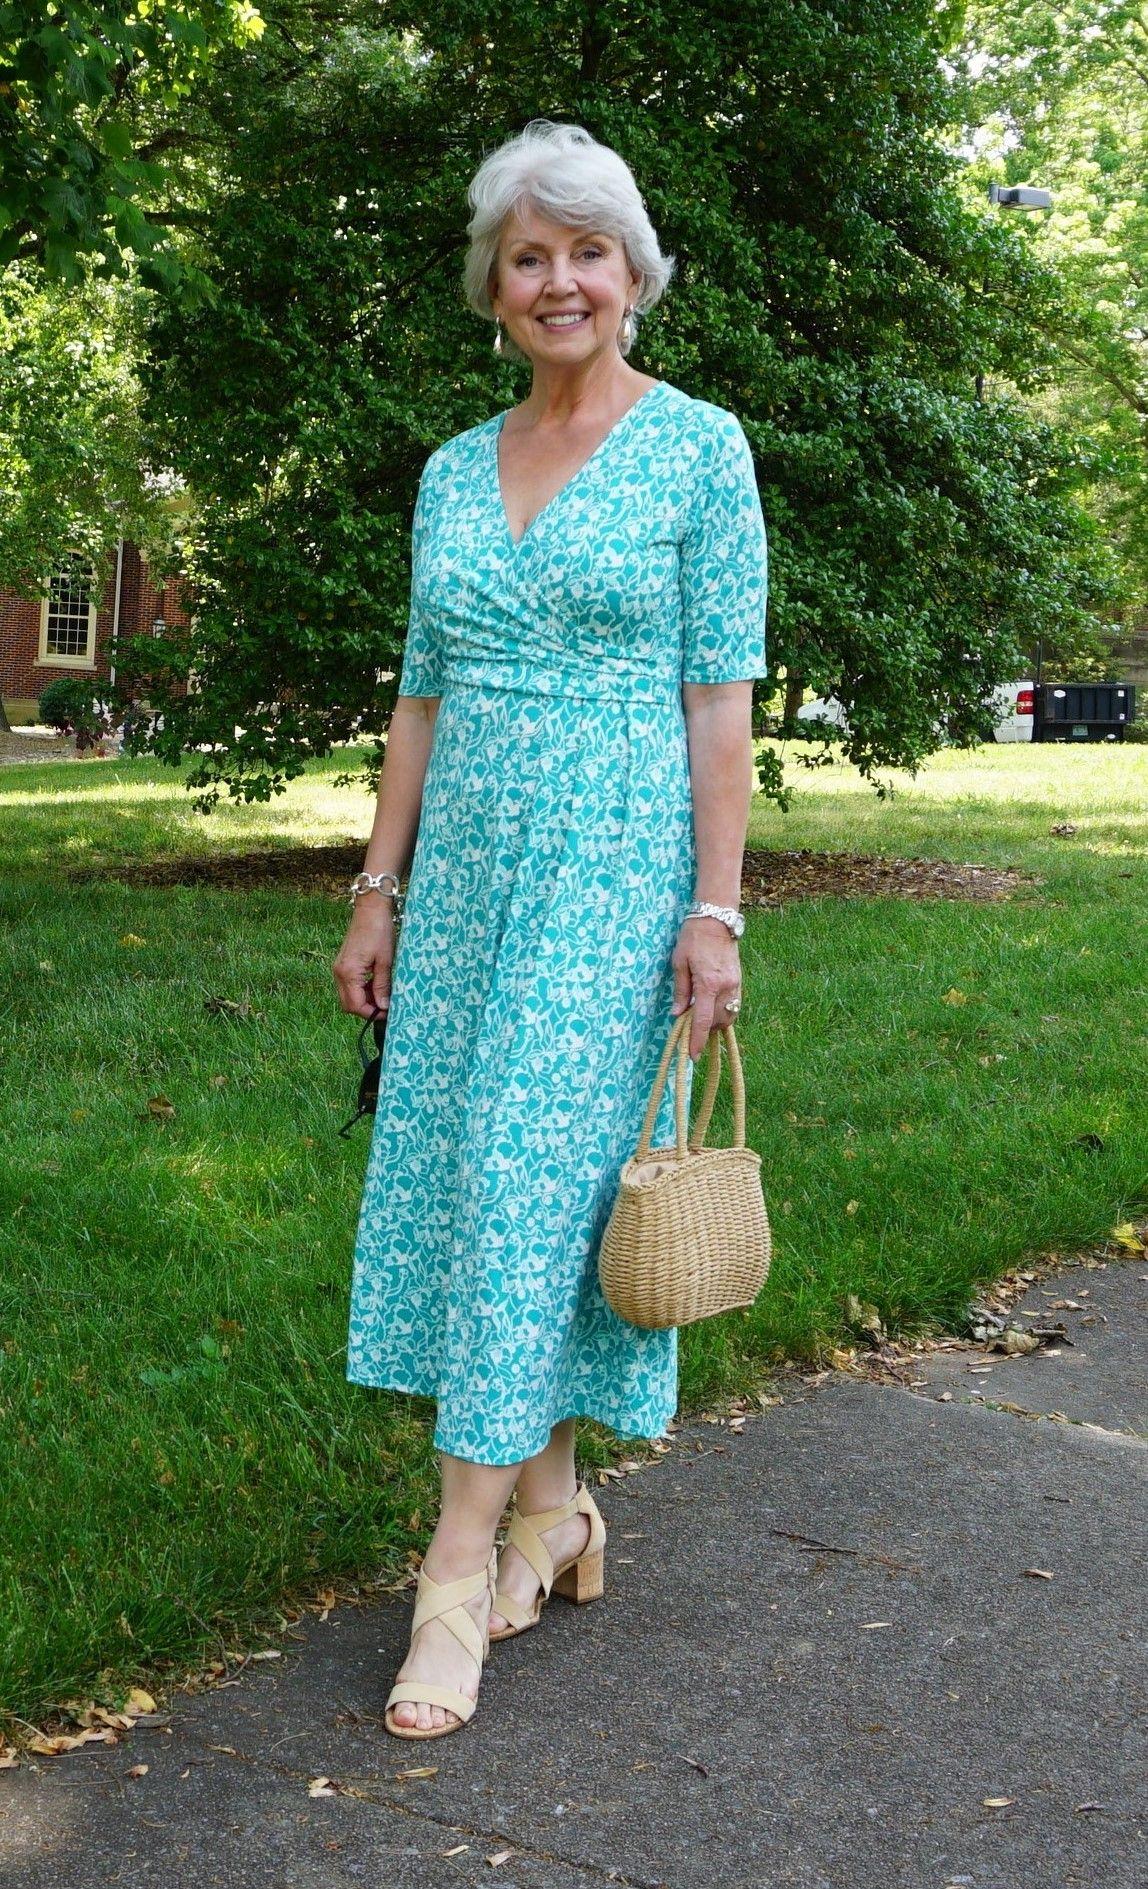 A Summer Dress Over 60 Fashion Stylish Older Women Summer Dresses [ 1889 x 1148 Pixel ]